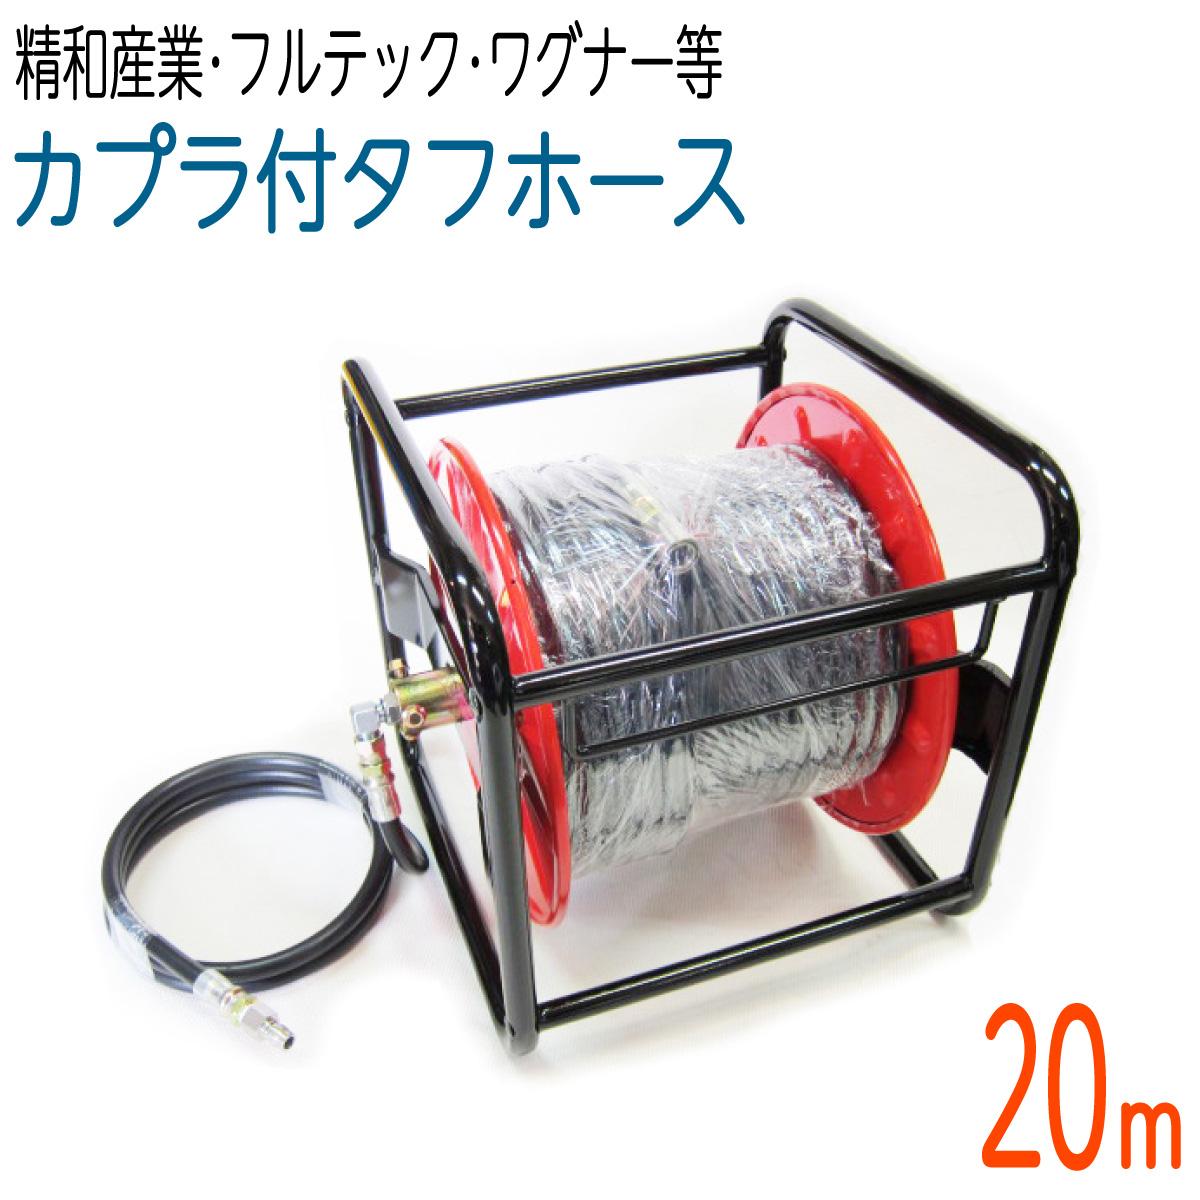 20Mリール巻き 3 ストアー 8 3分 タフホース 日本メーカー新品 ワンタッチカプラ付高圧洗浄機